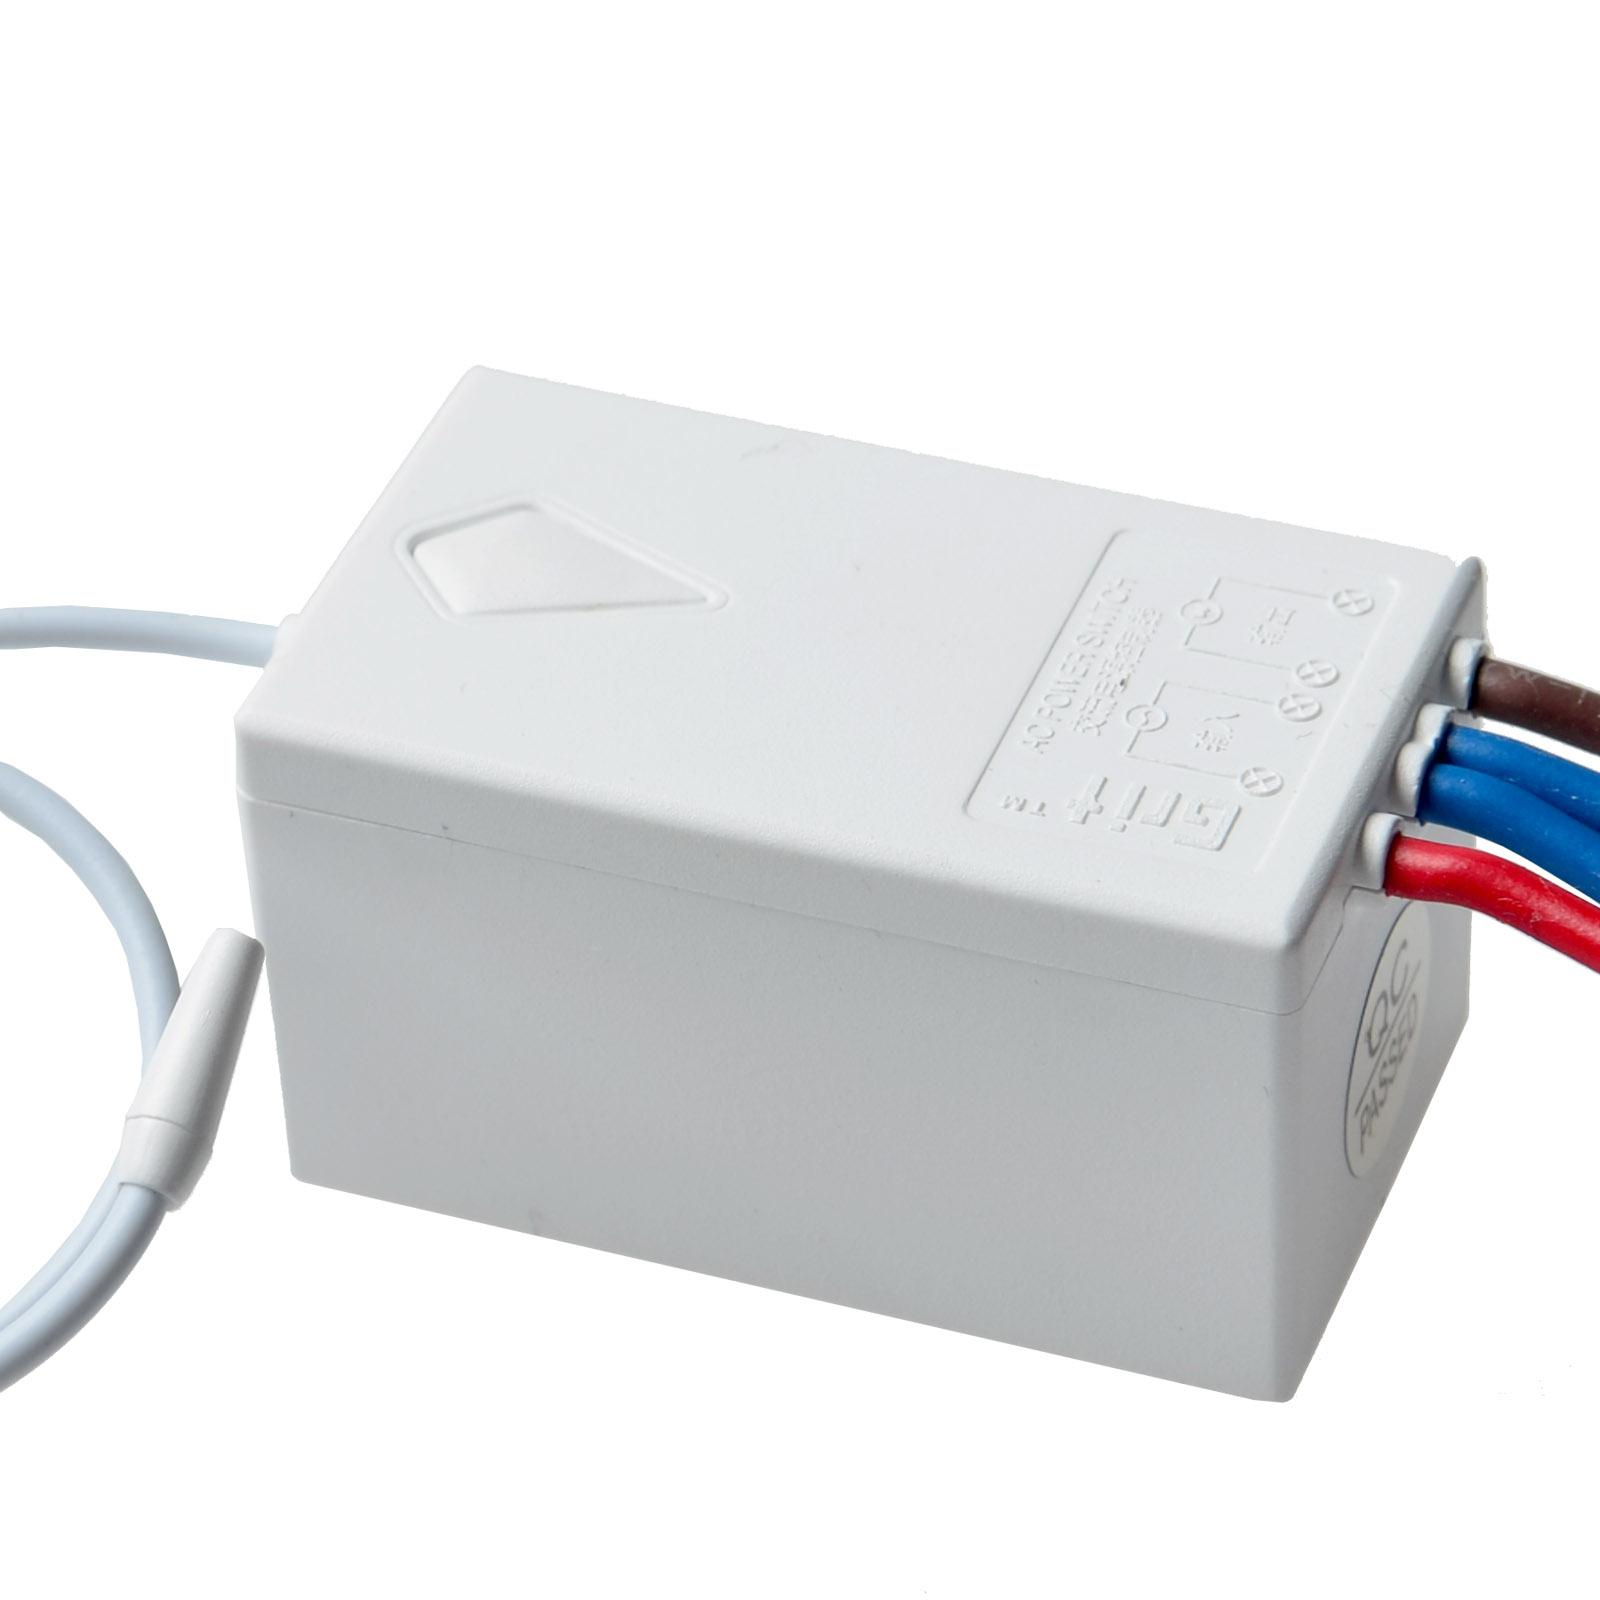 WIRELESS SMART LAMP Light Wall Switch Home Single 1 Way ON/OFF ...